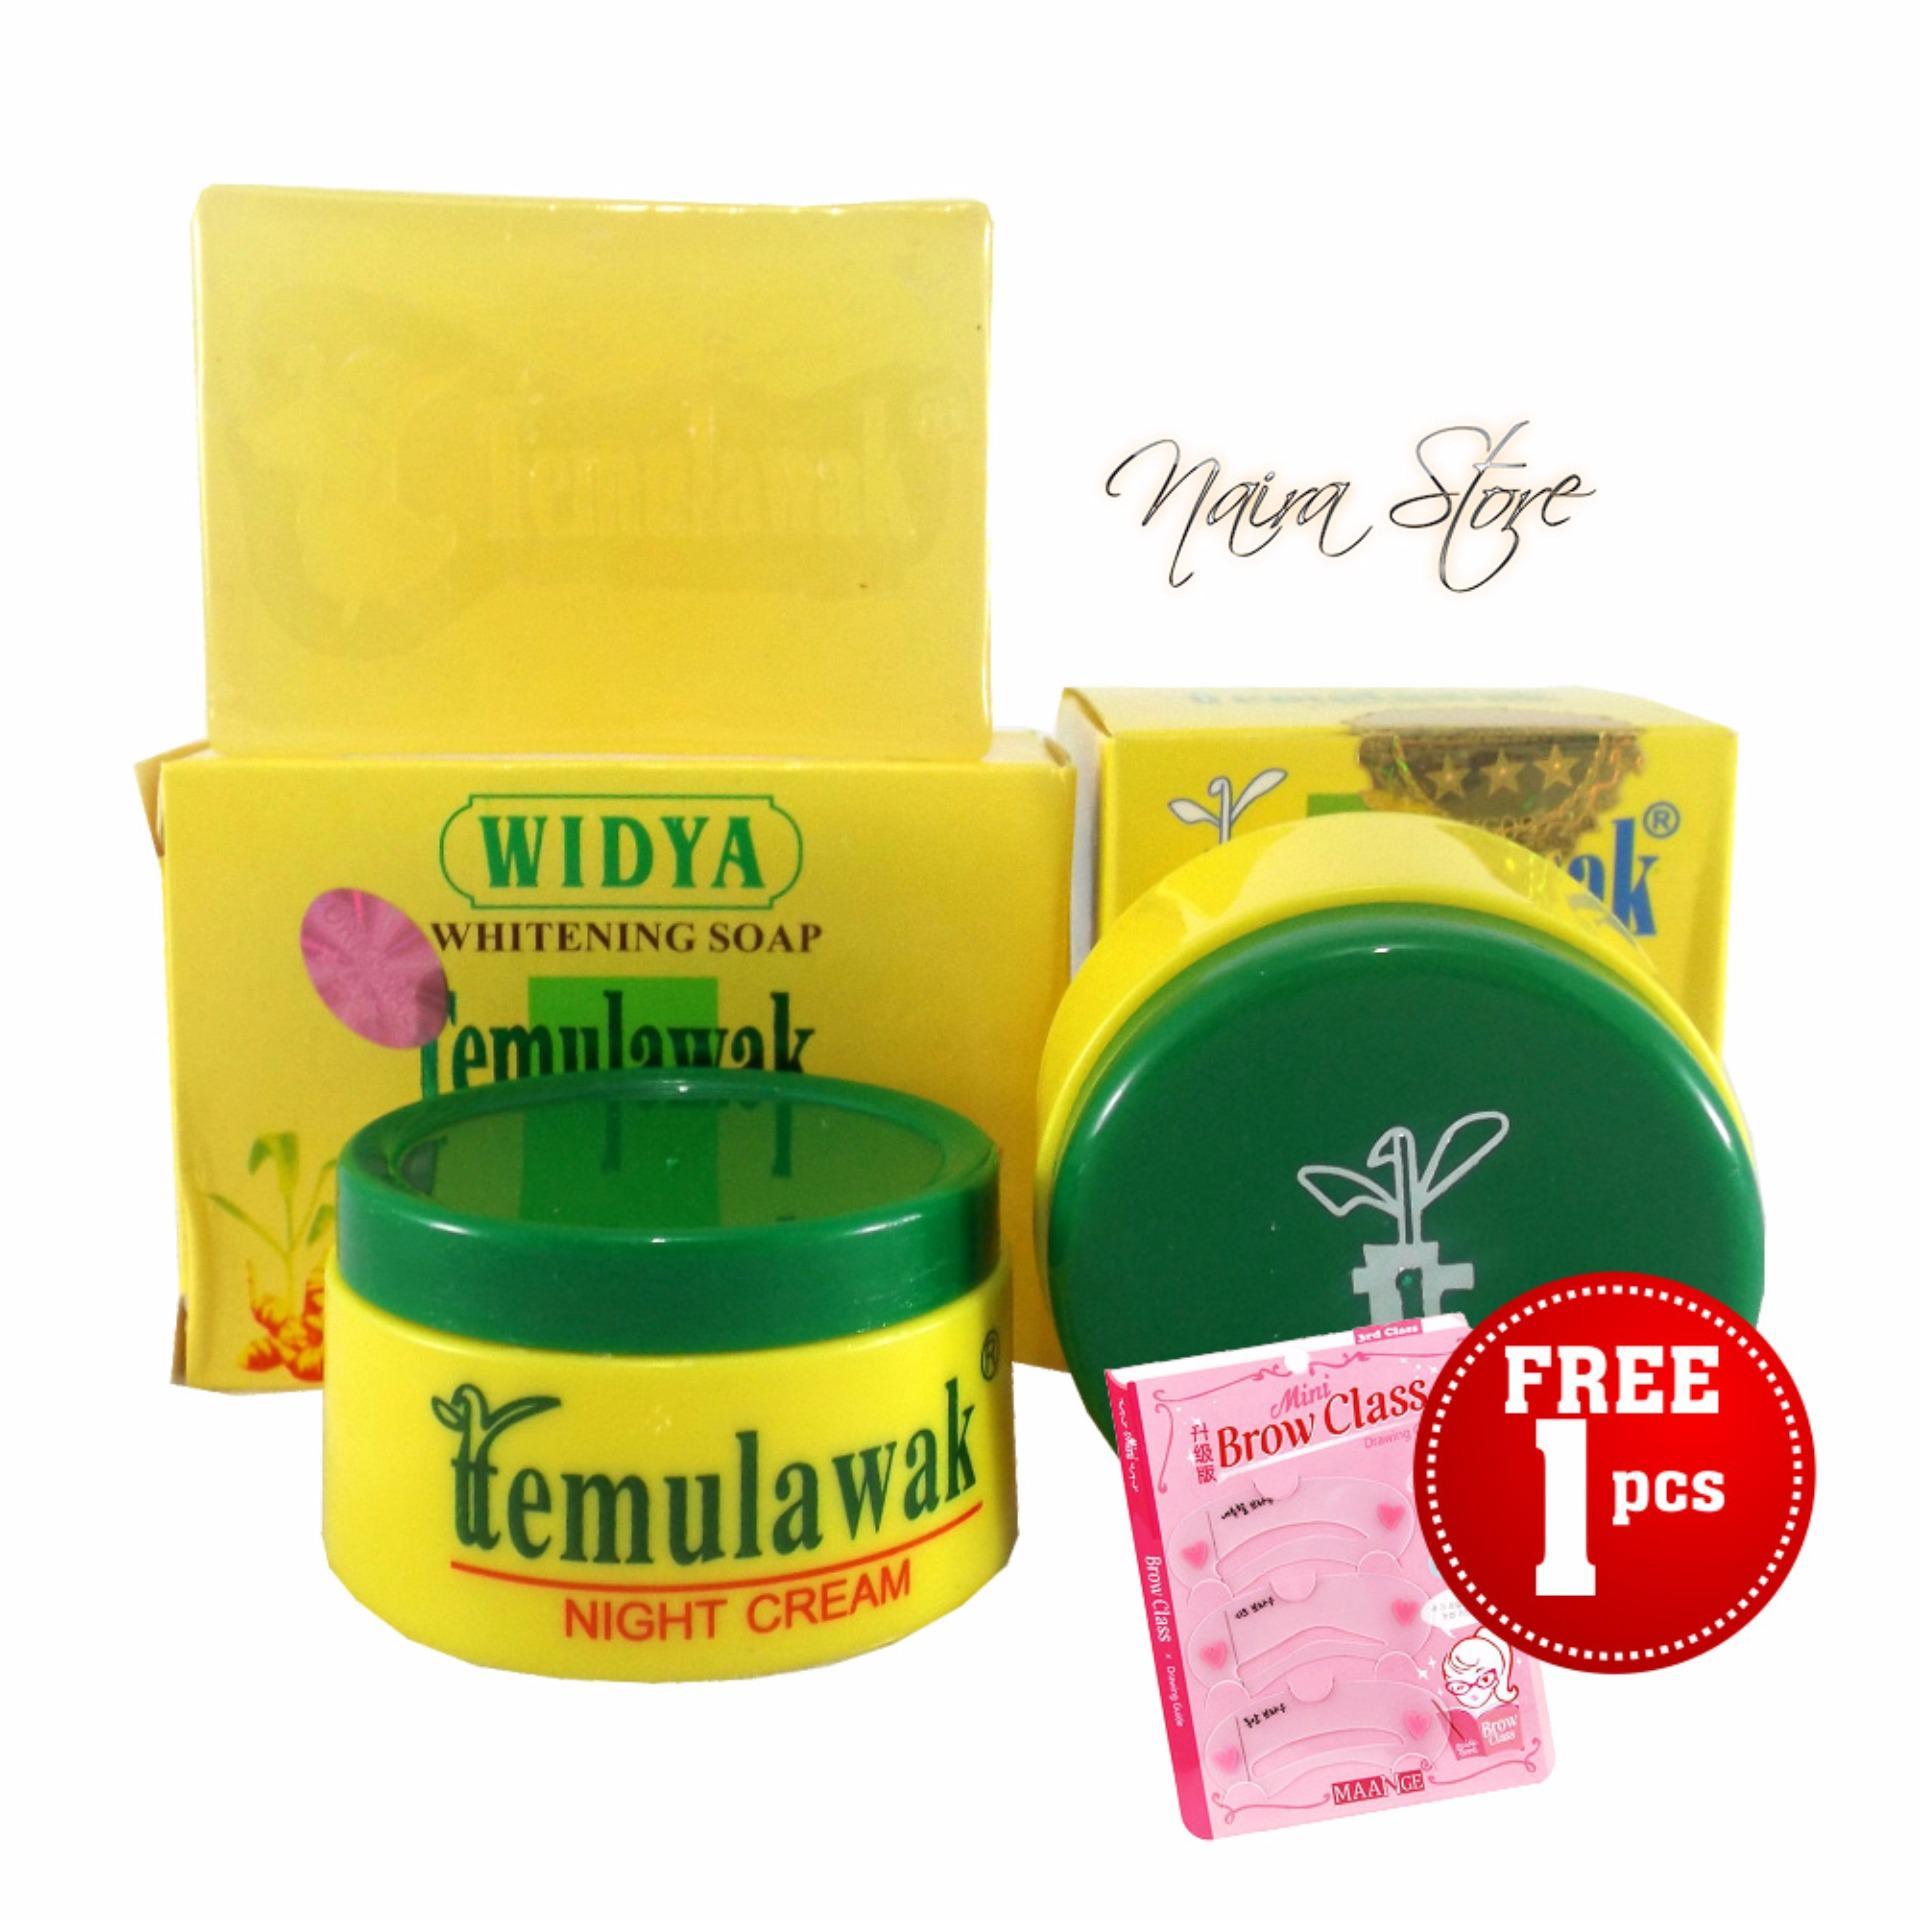 Cari Bandingkan Cream Temulawak Original Holo Super 1 Paket Free Bedak Cetakan Alis Mini Brow Class